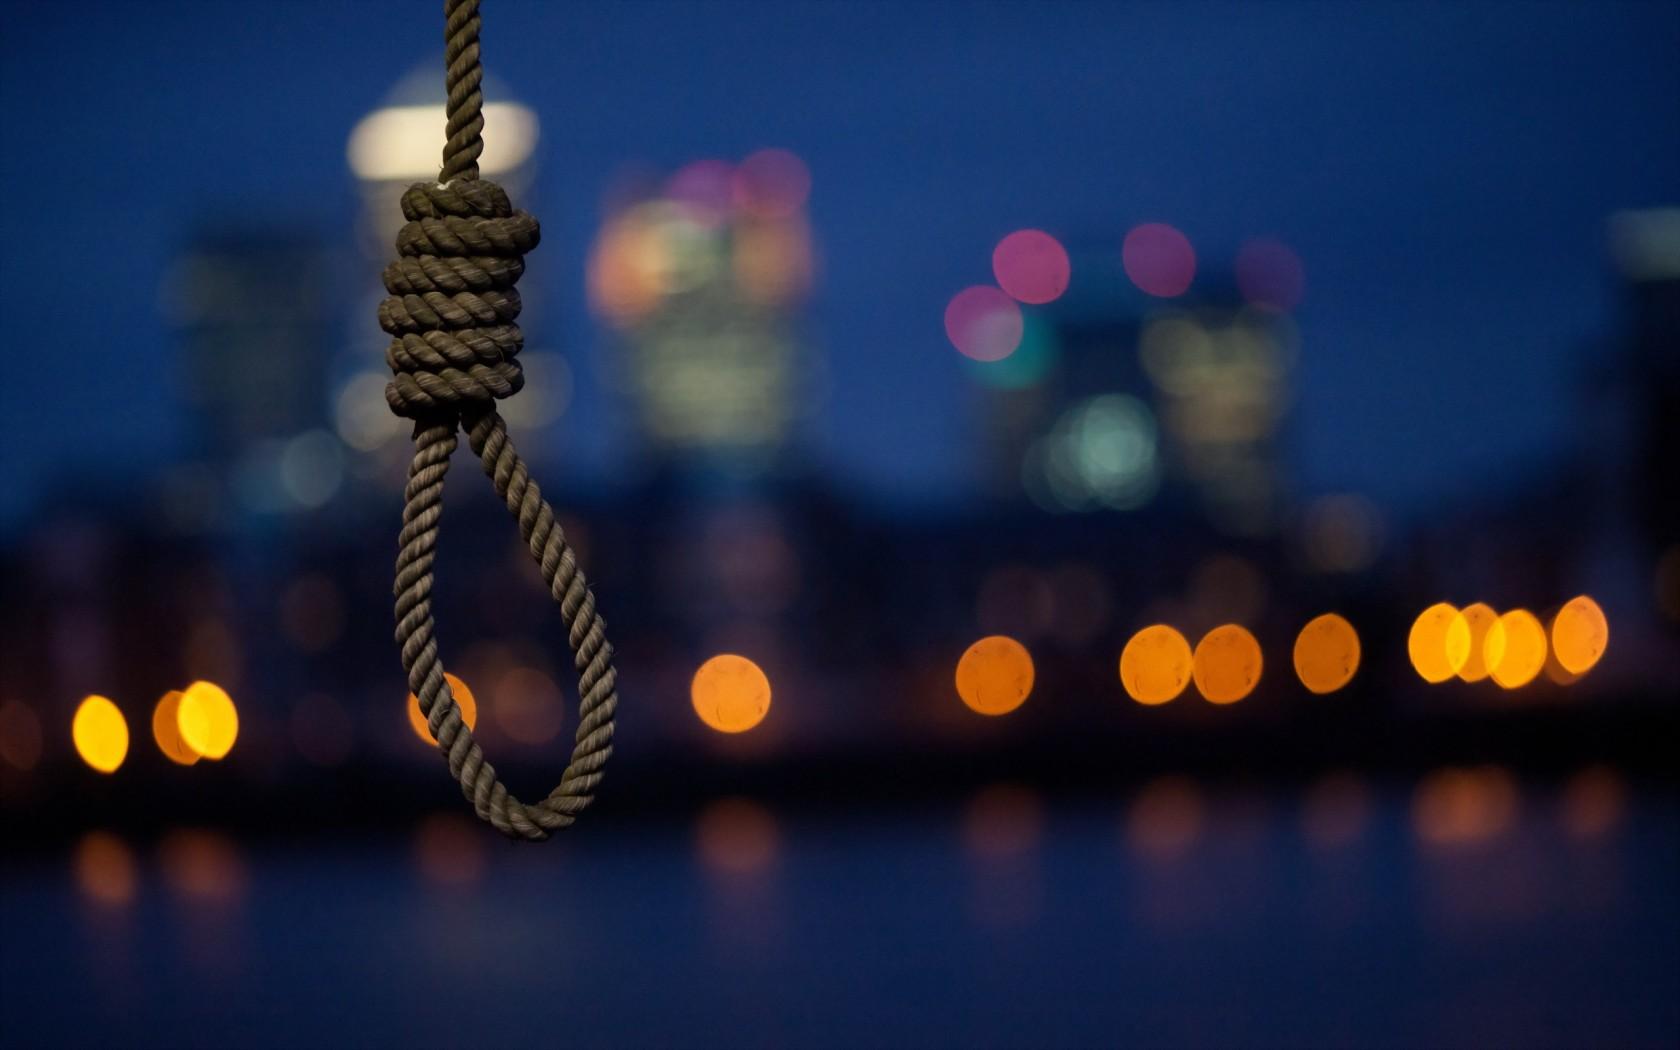 На Херсонщине девочка-подросток совершила самоубийство